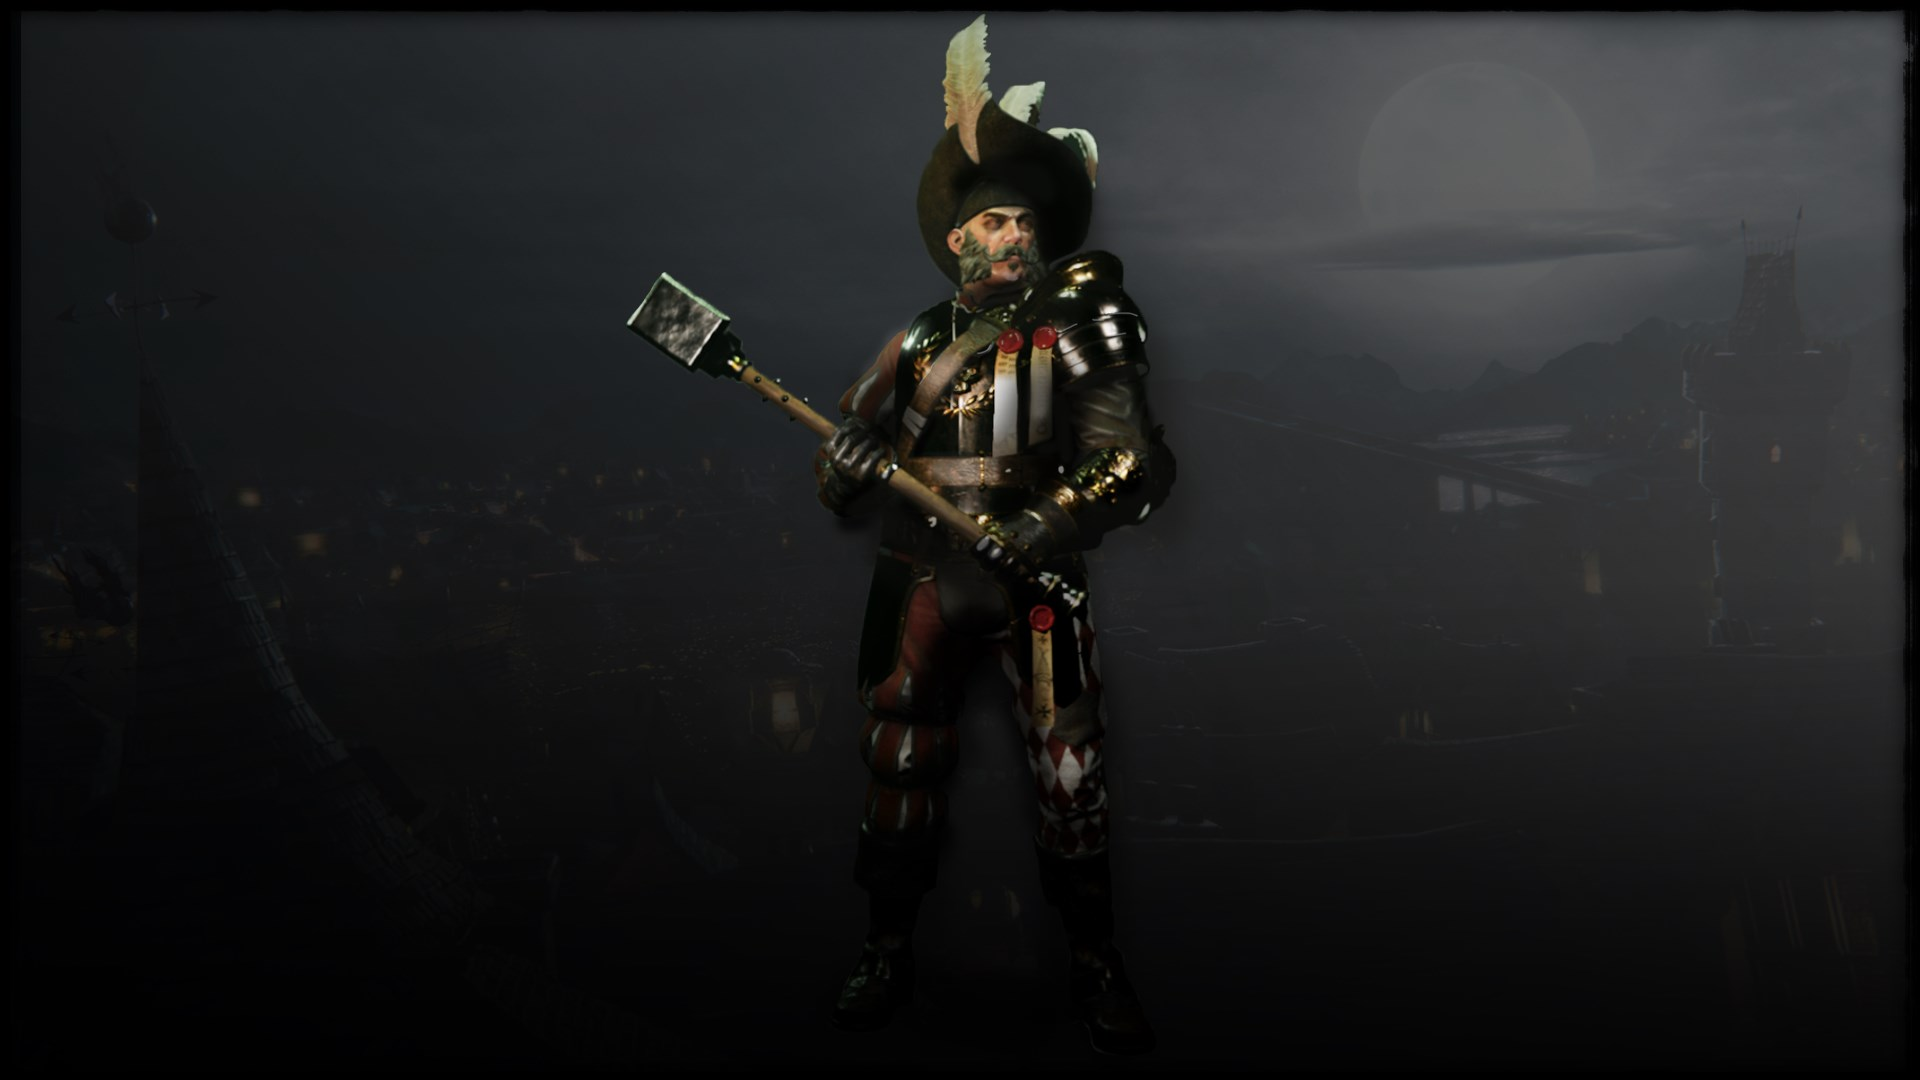 Warhammer Vermintide - Kruber 'Carroburg Livery' Skin